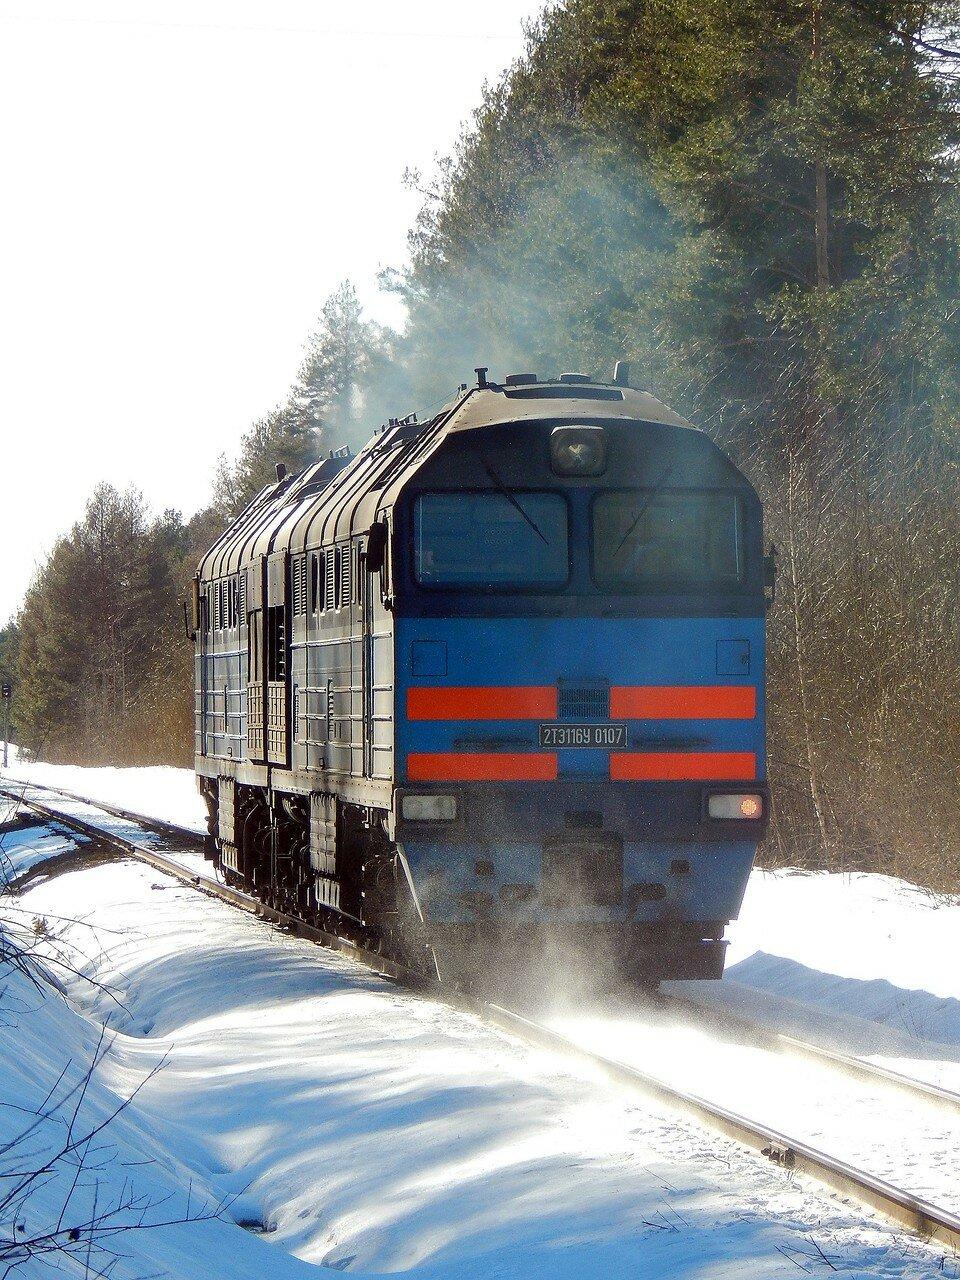 Поездка Кашин - Савёлово, апрель 2017г. 0_172815_abcc2061_XXXL